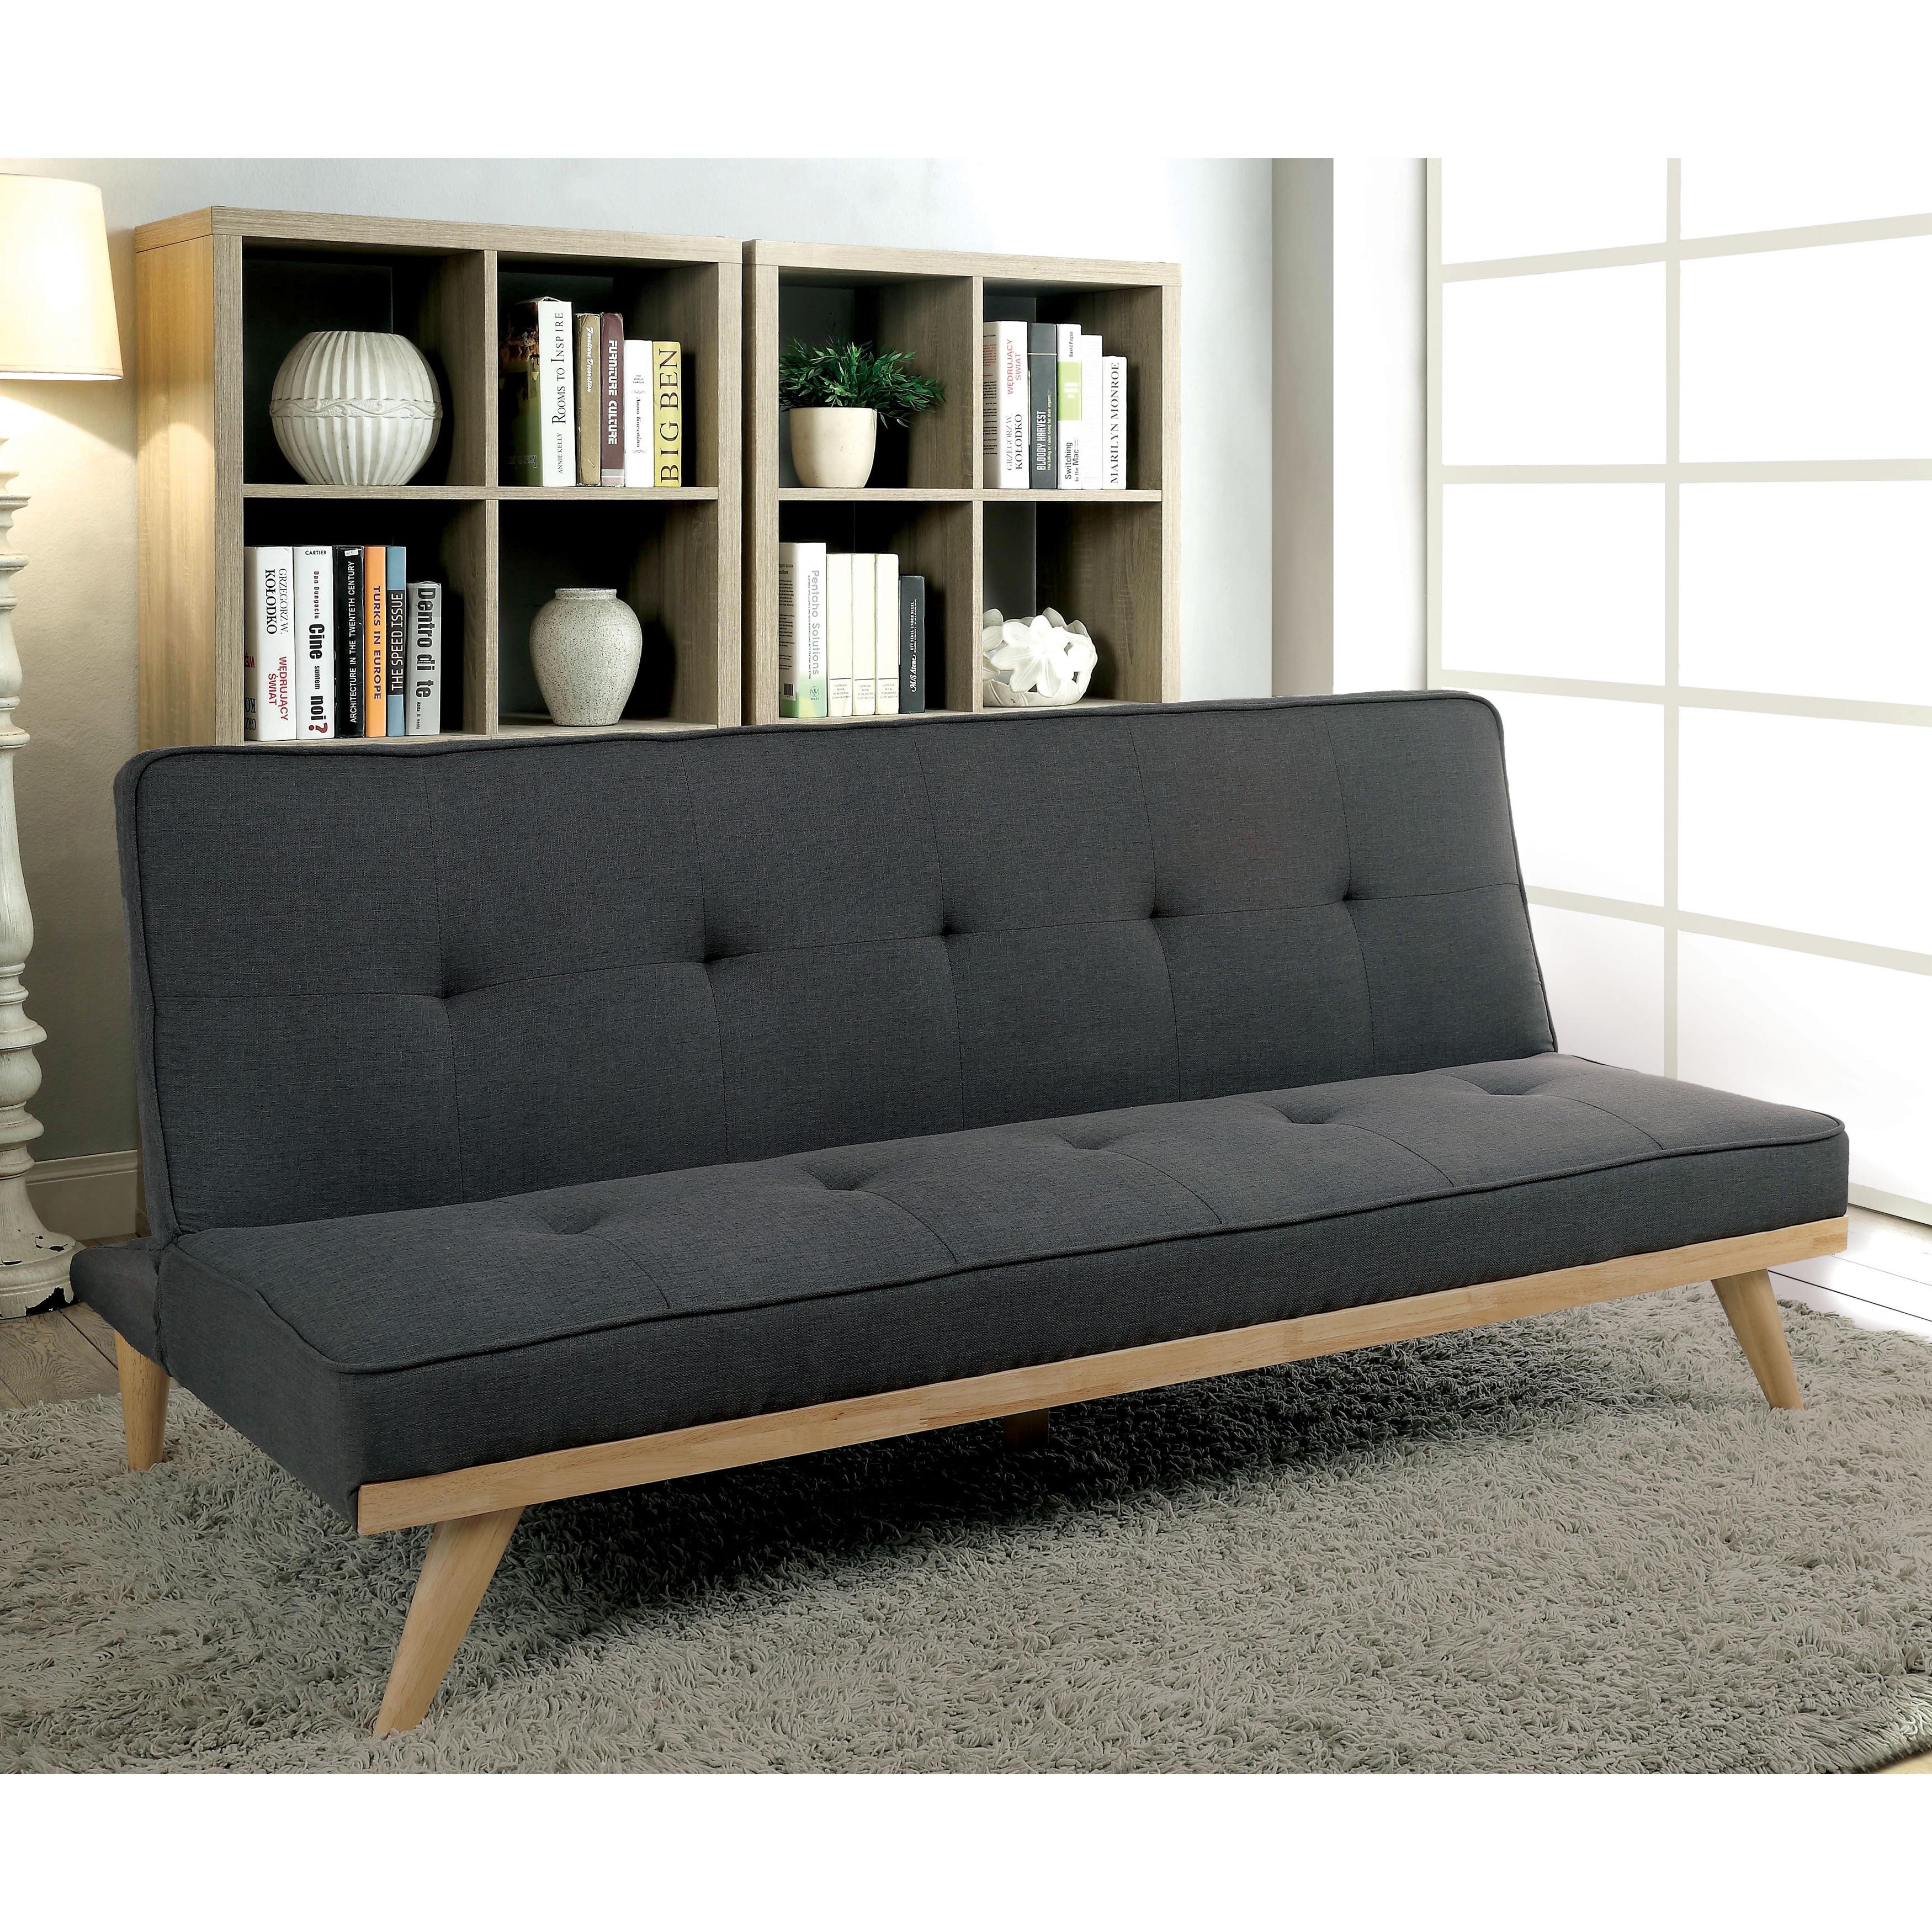 Furniture of america talena mid century modern tufted for Mid century american furniture